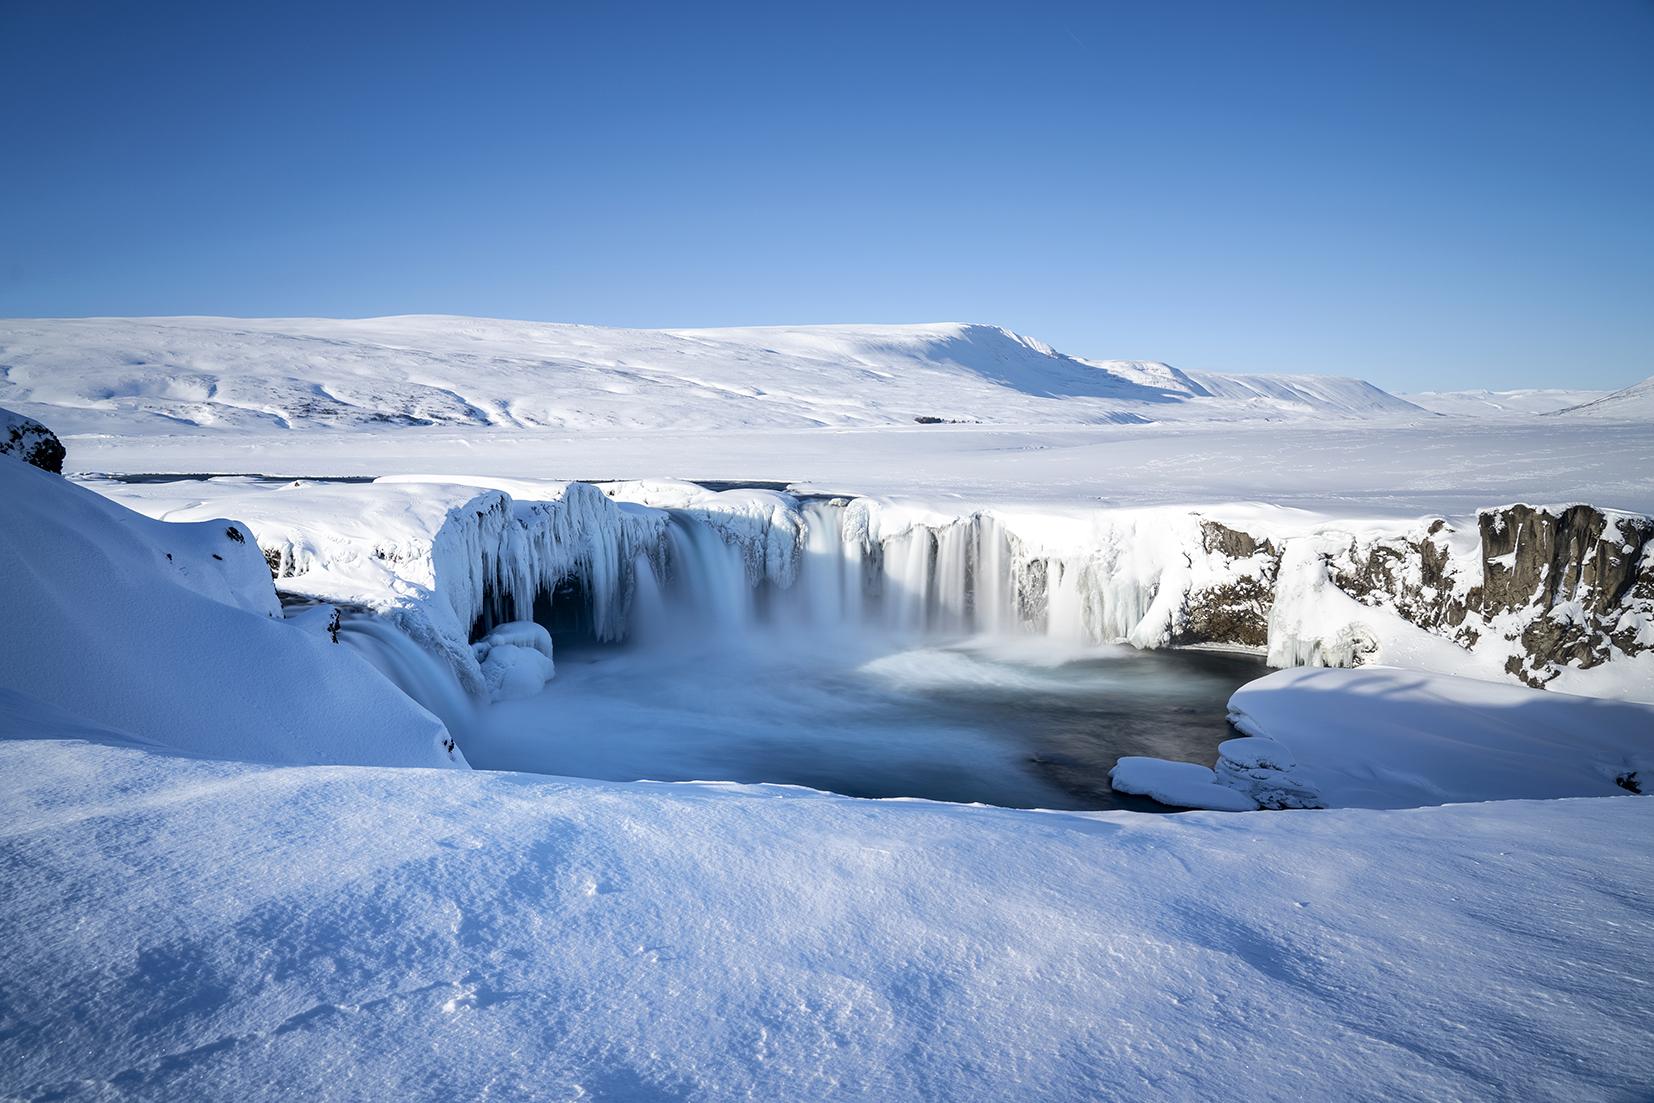 Islande du Nord Goðafoss vue d'ensemble cascade féerique neige eau stalactites ciel bleu